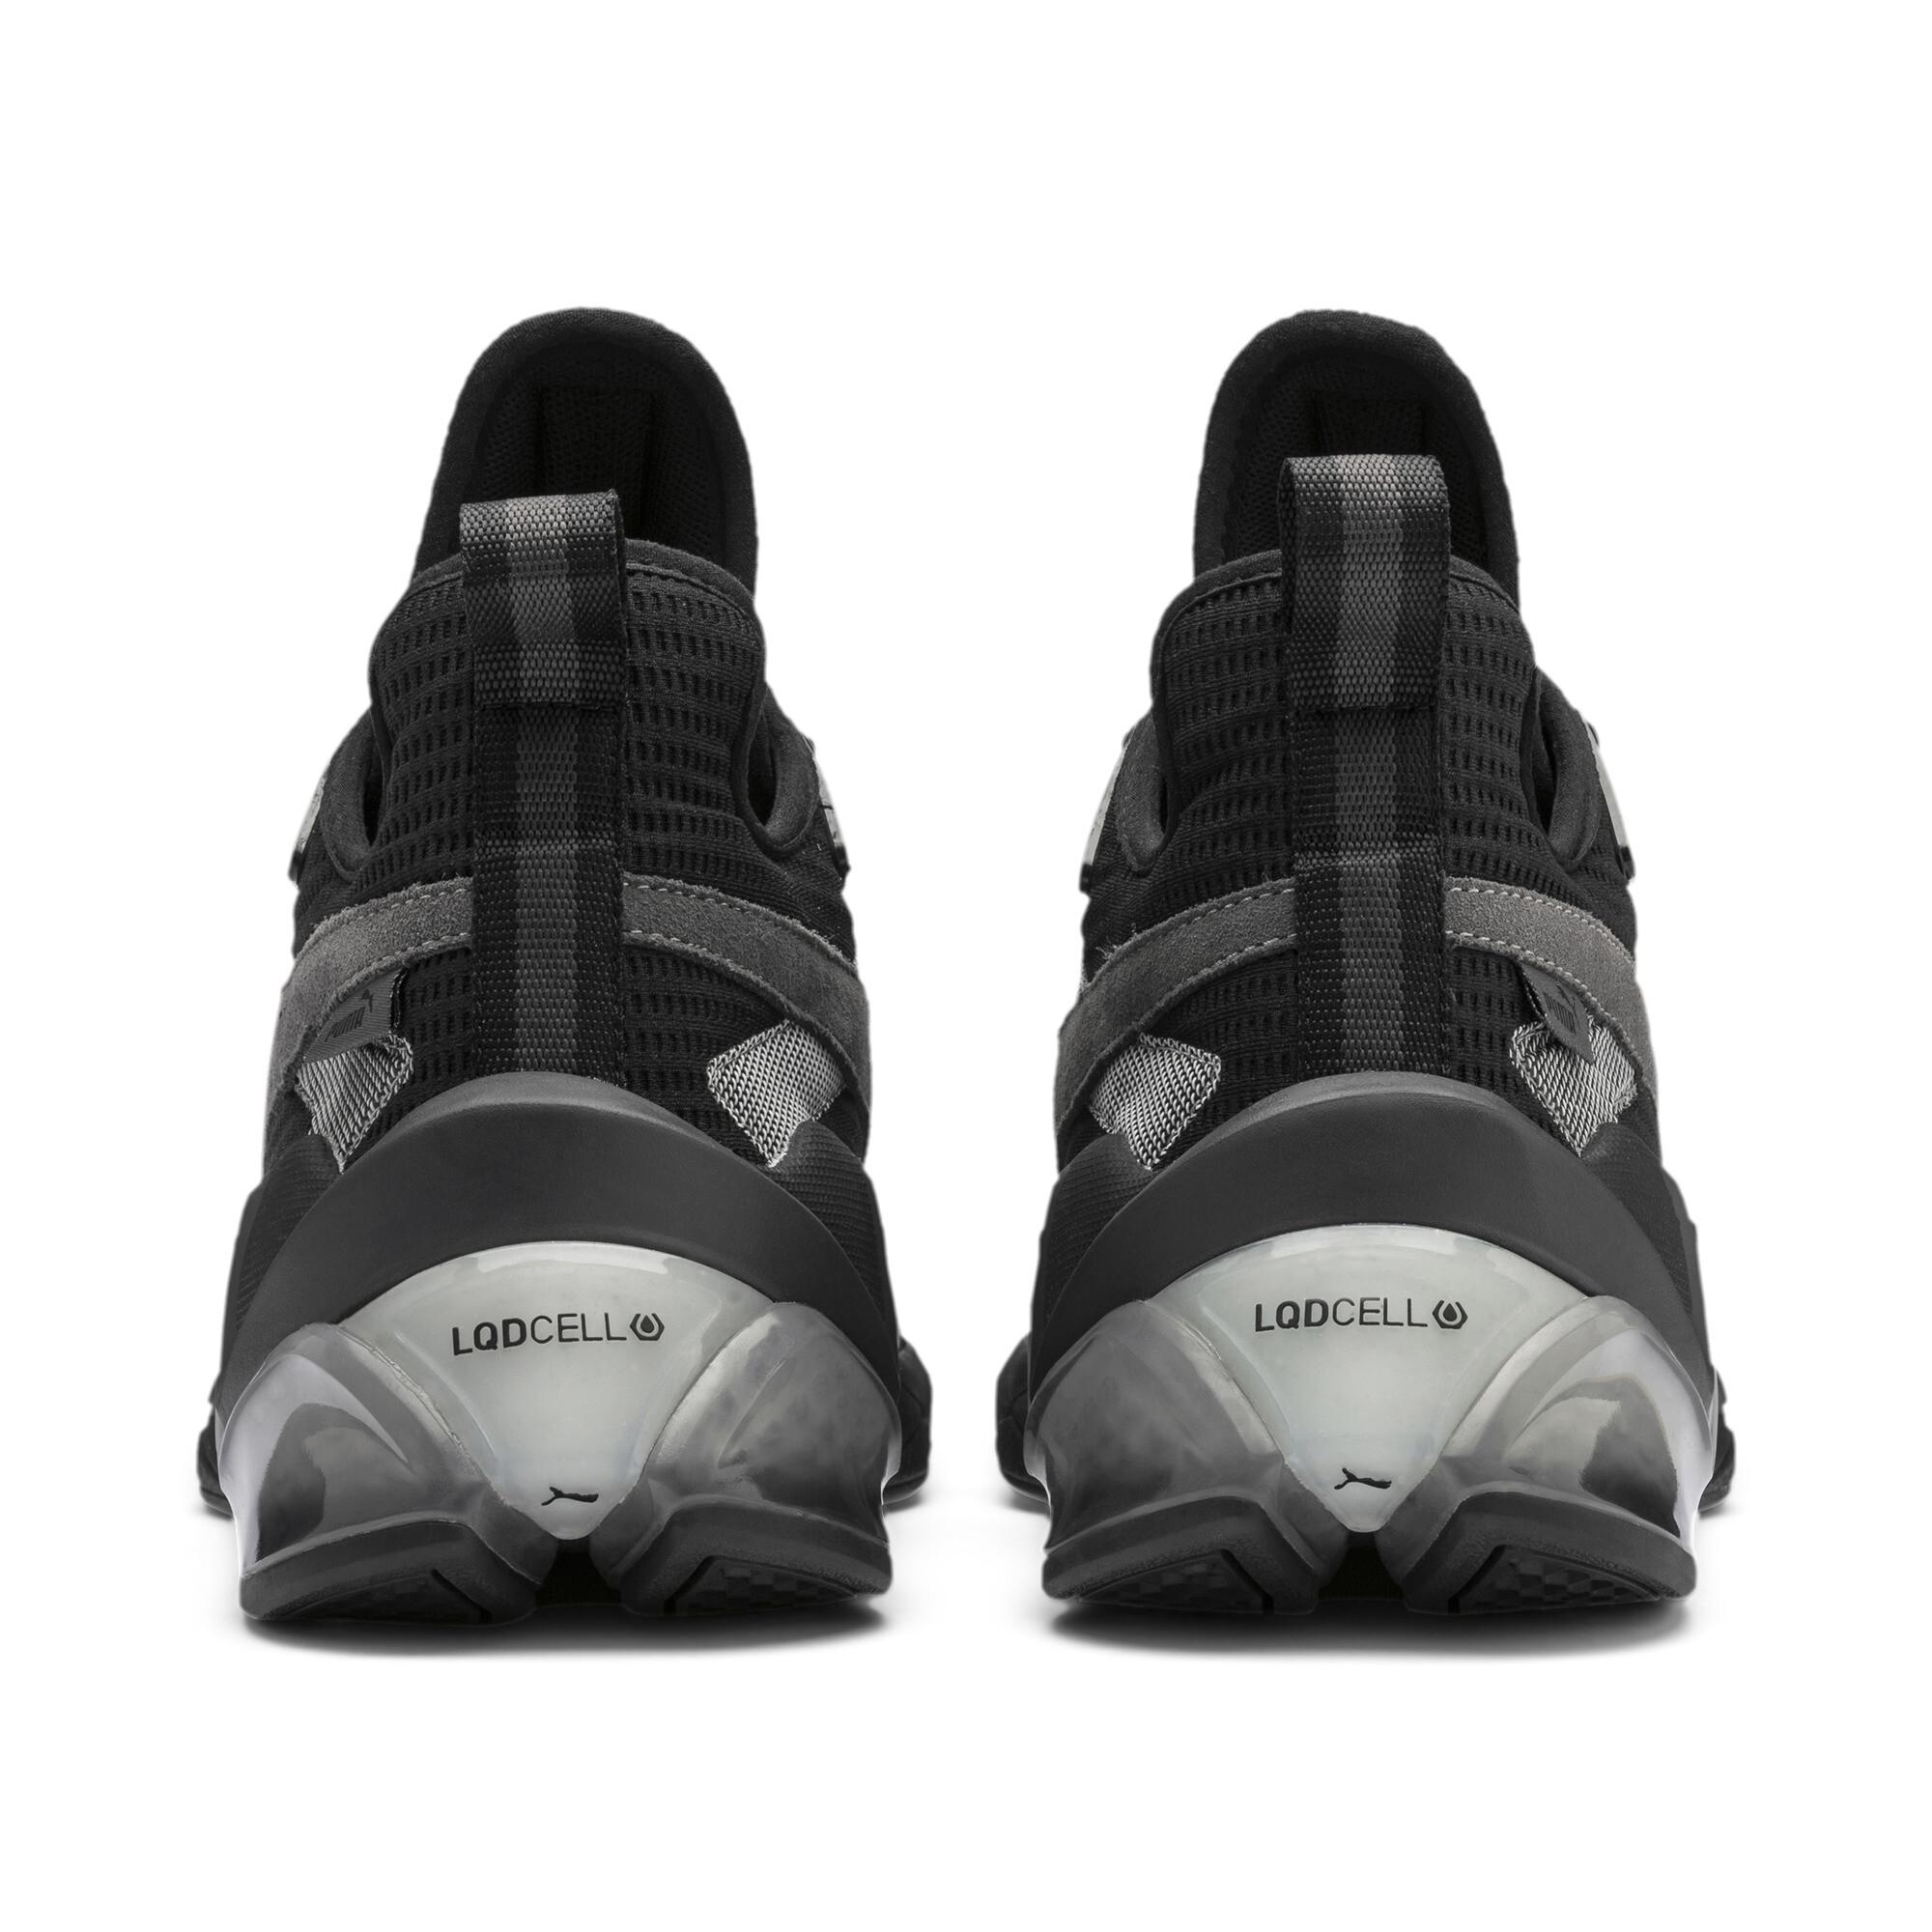 PUMA-Men-039-s-LQDCELL-Origin-Training-Shoes thumbnail 7